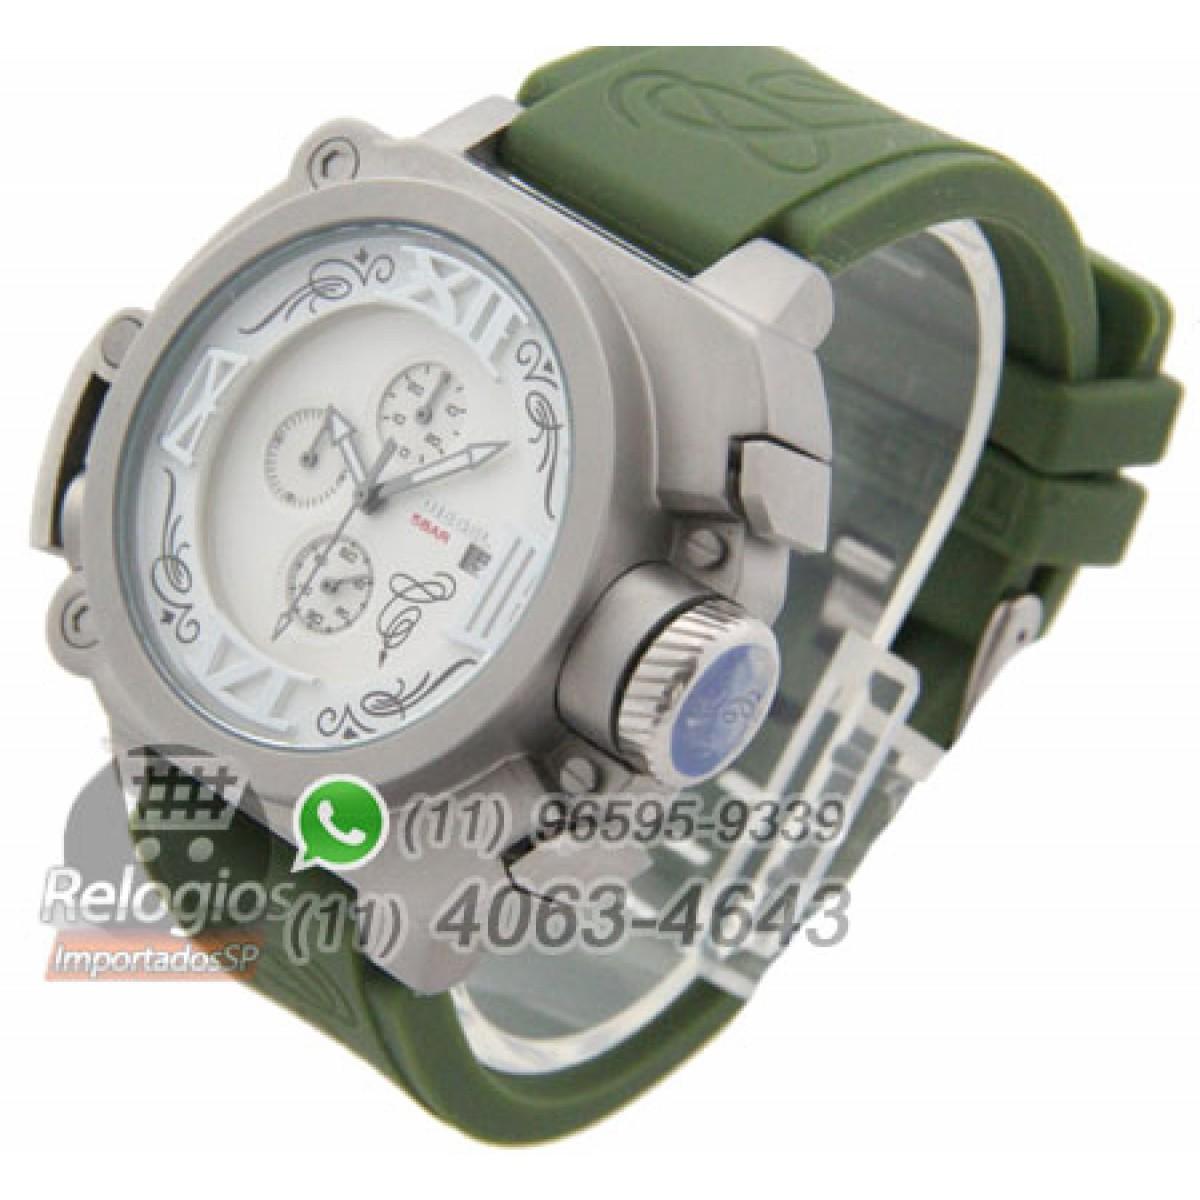 507ba2462f7 Relógio Réplica Diesel Batman Prata Verde ( PROMOÇÃO )